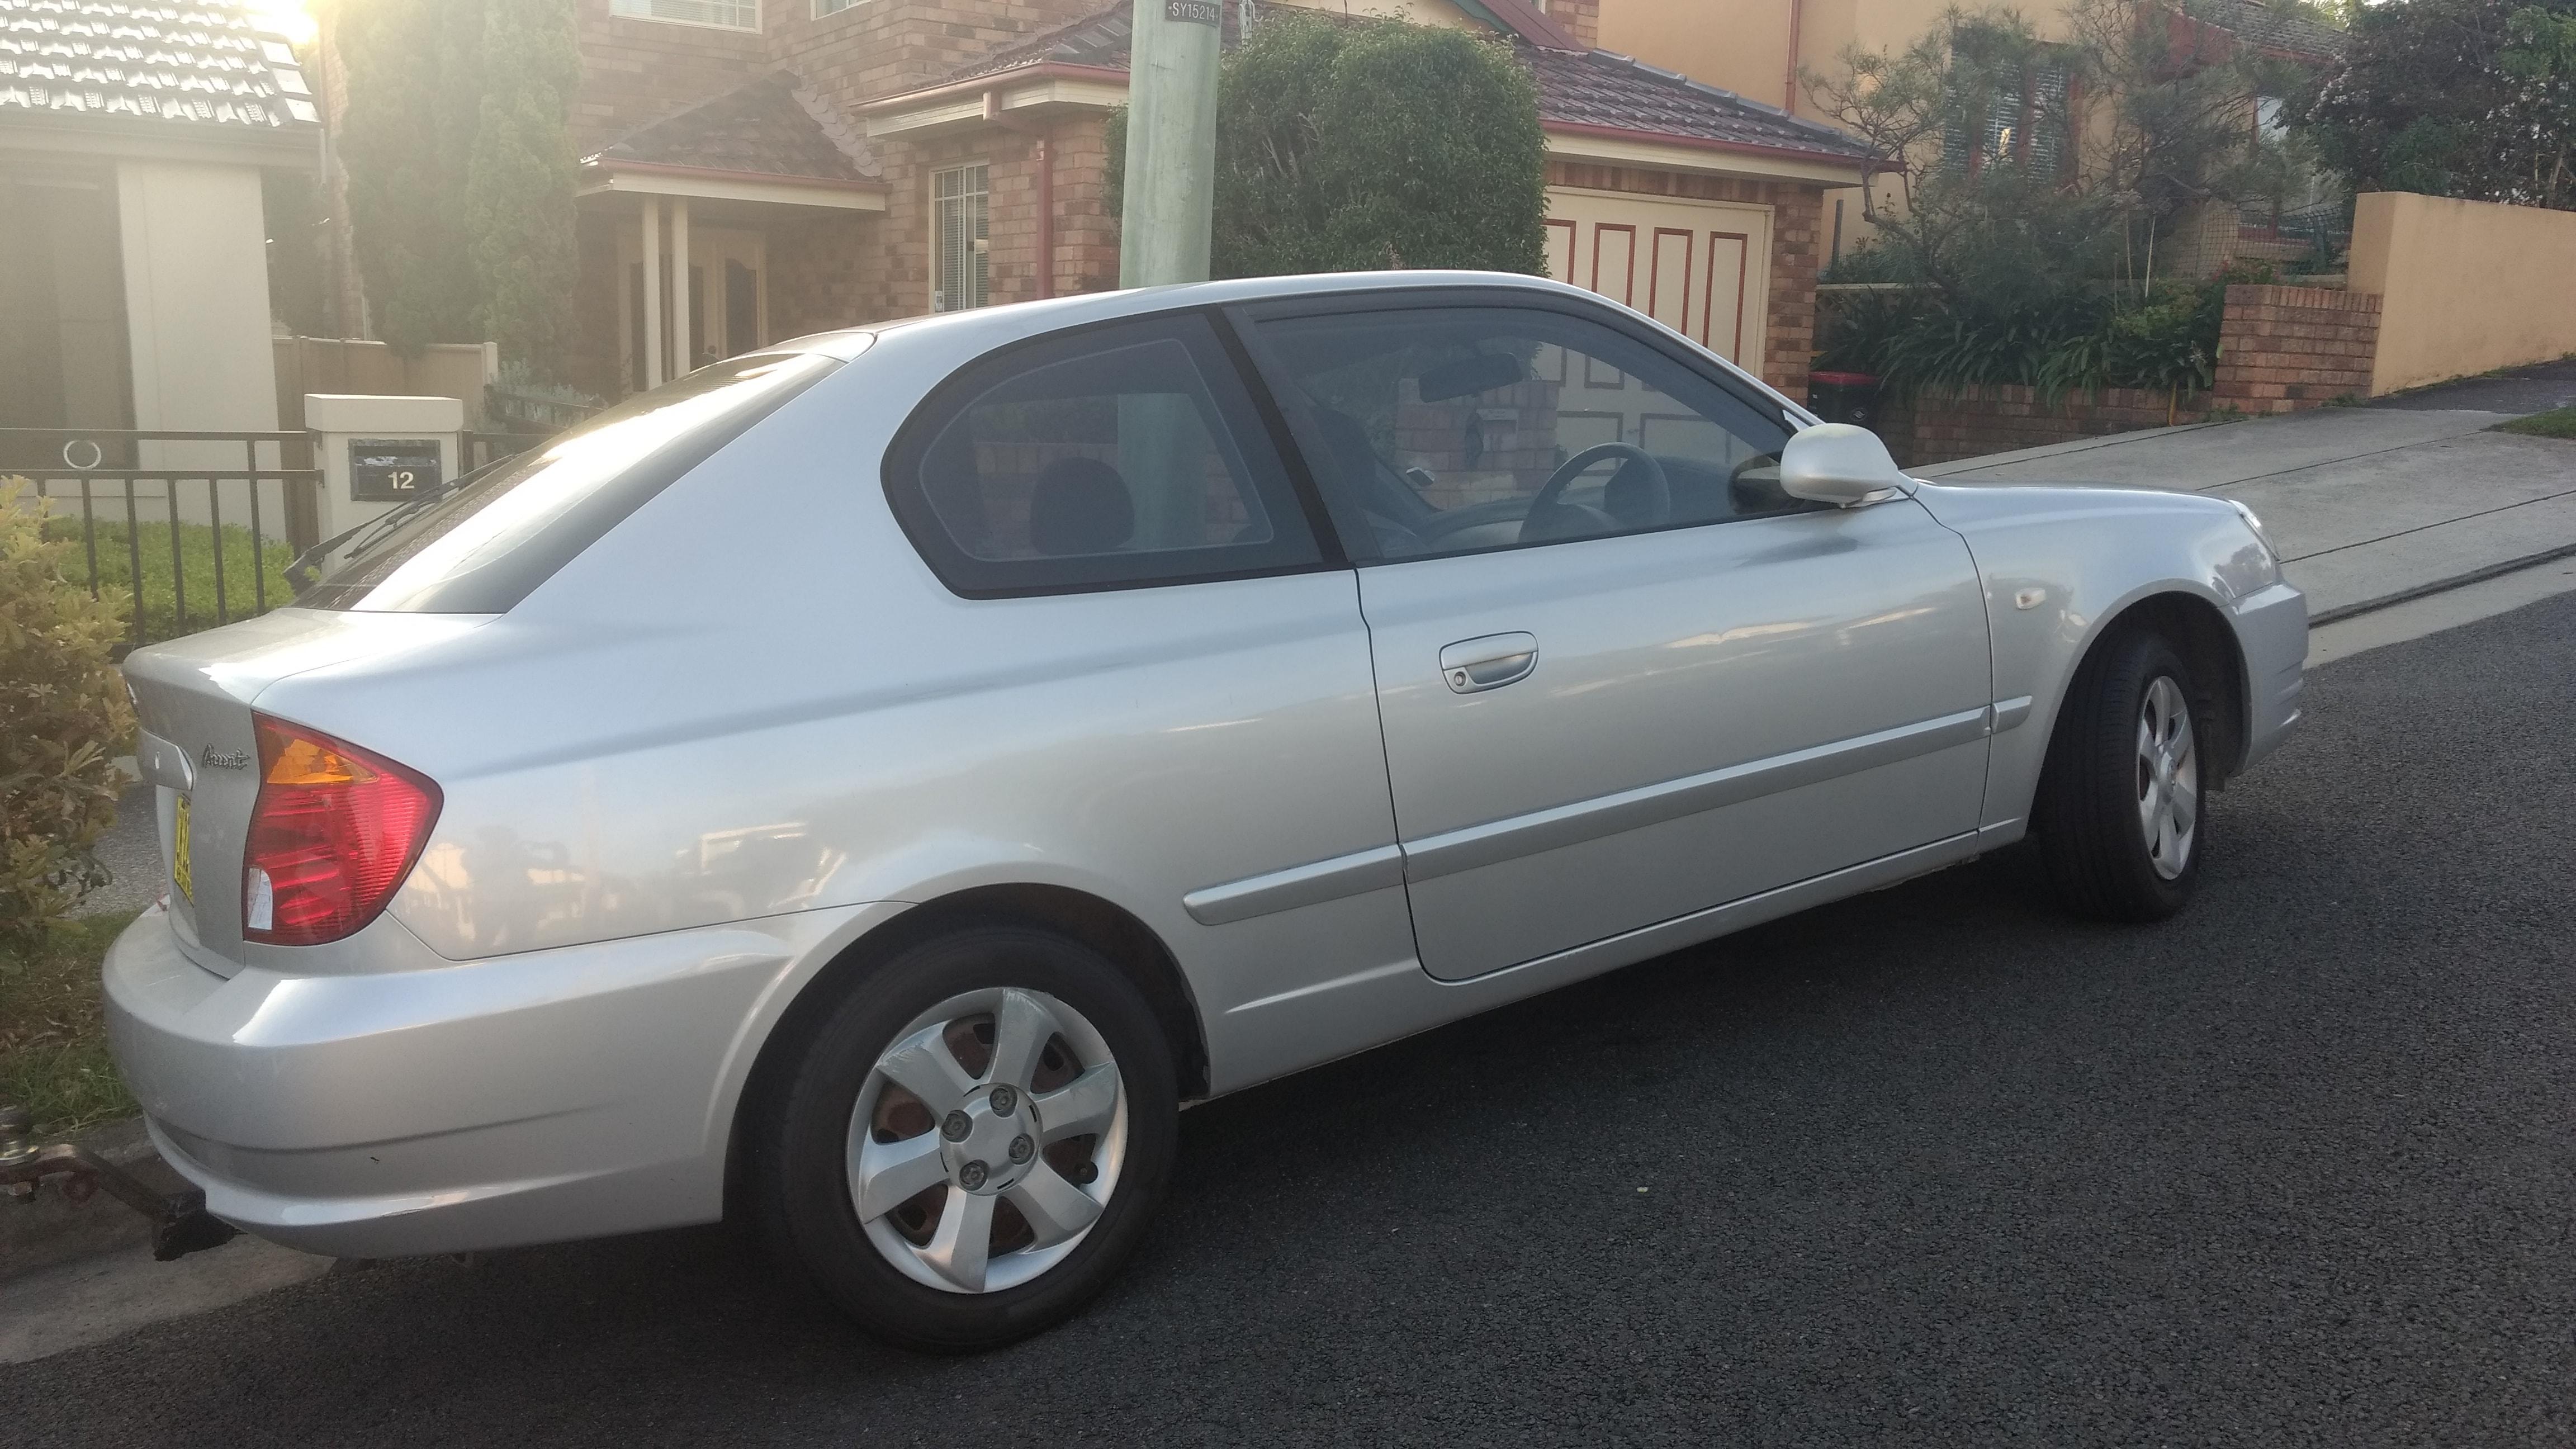 Picture of Elvire's 2005 Hyundai Accent